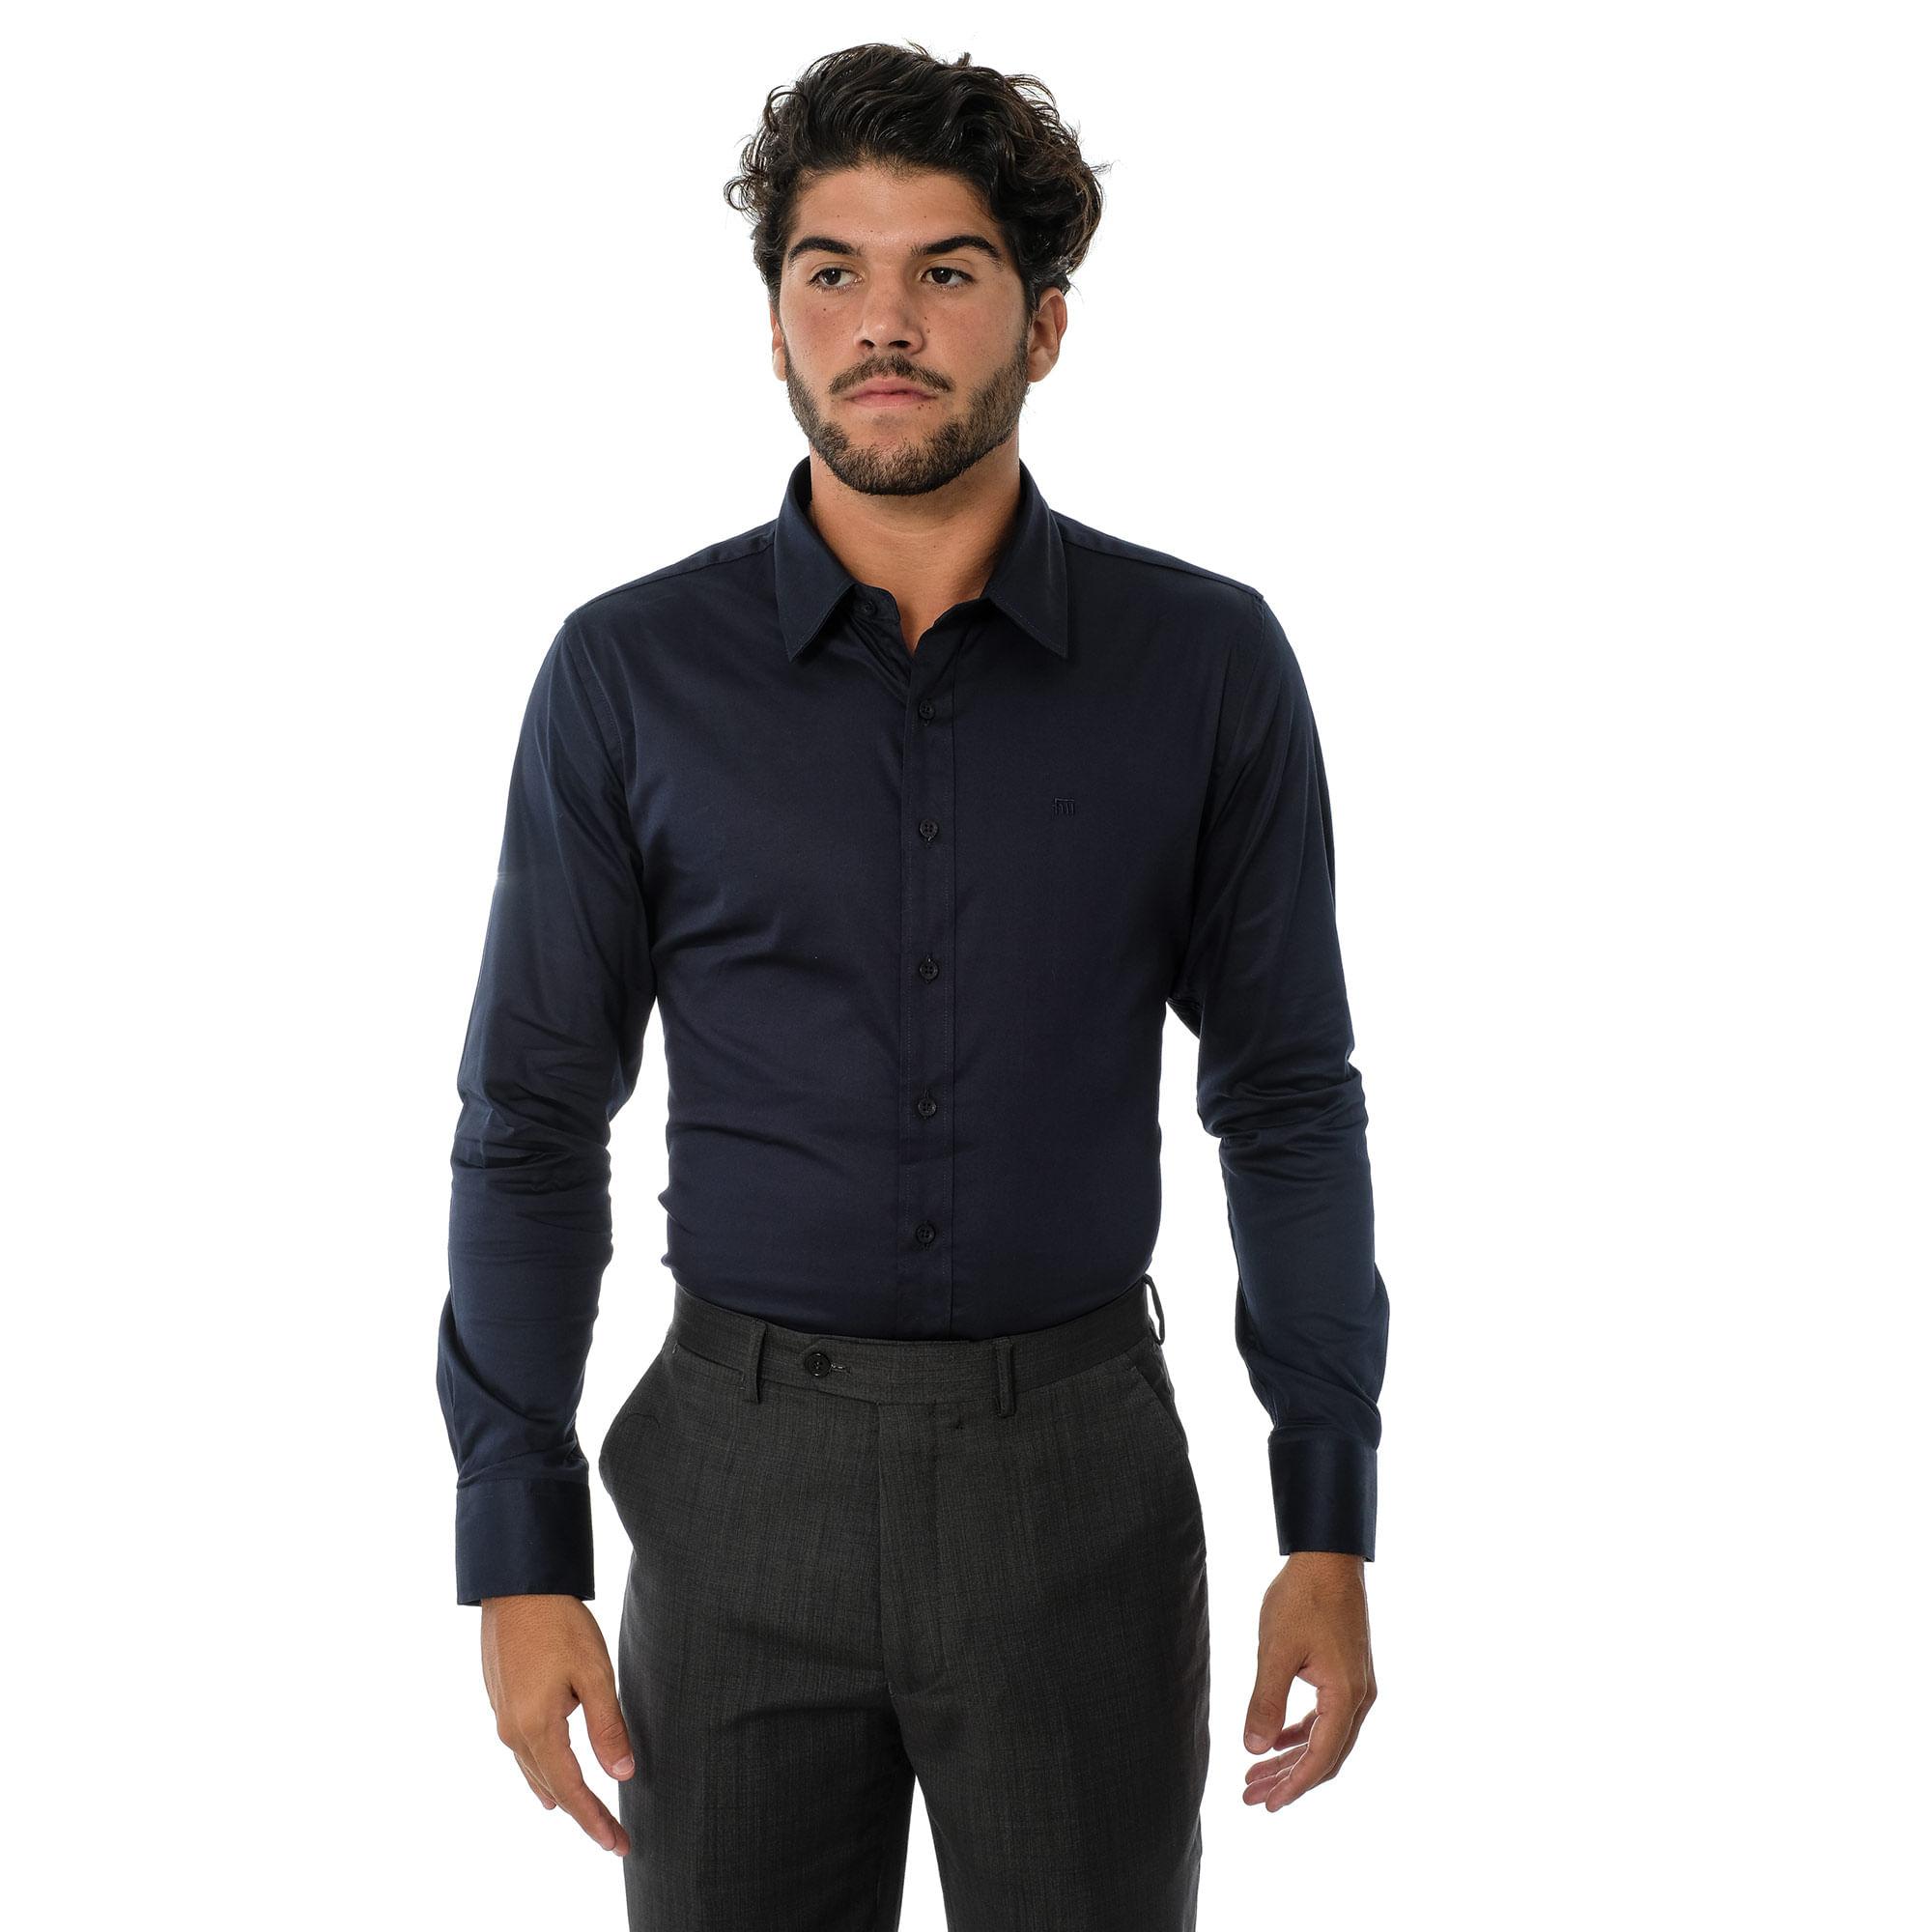 319beeb87 Camisa Social ML Acetinada - lojafattoamano